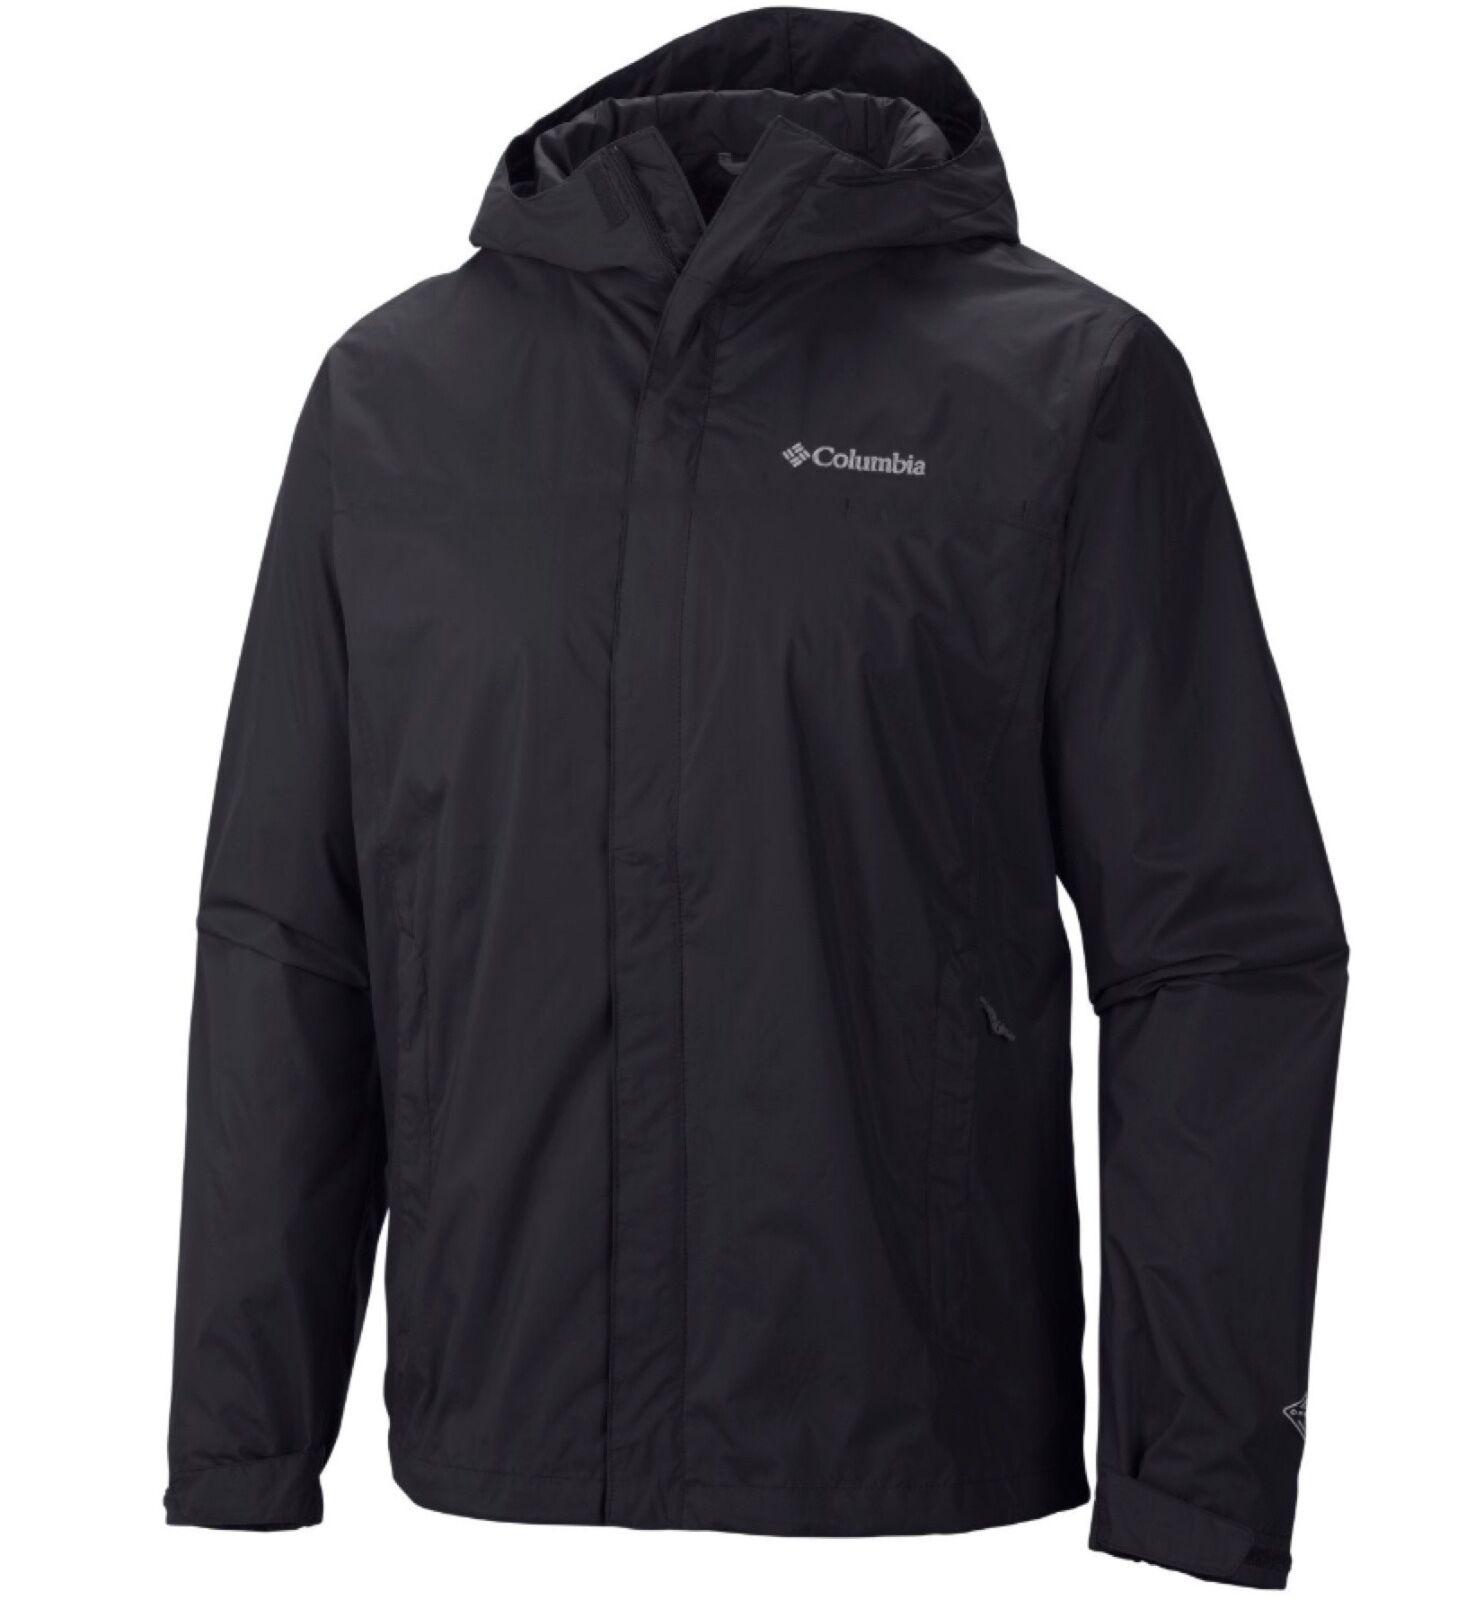 New Columbia mens Timber Pointe waterproof rain jacket coat Black Big Tall  фото 766f2b6e422